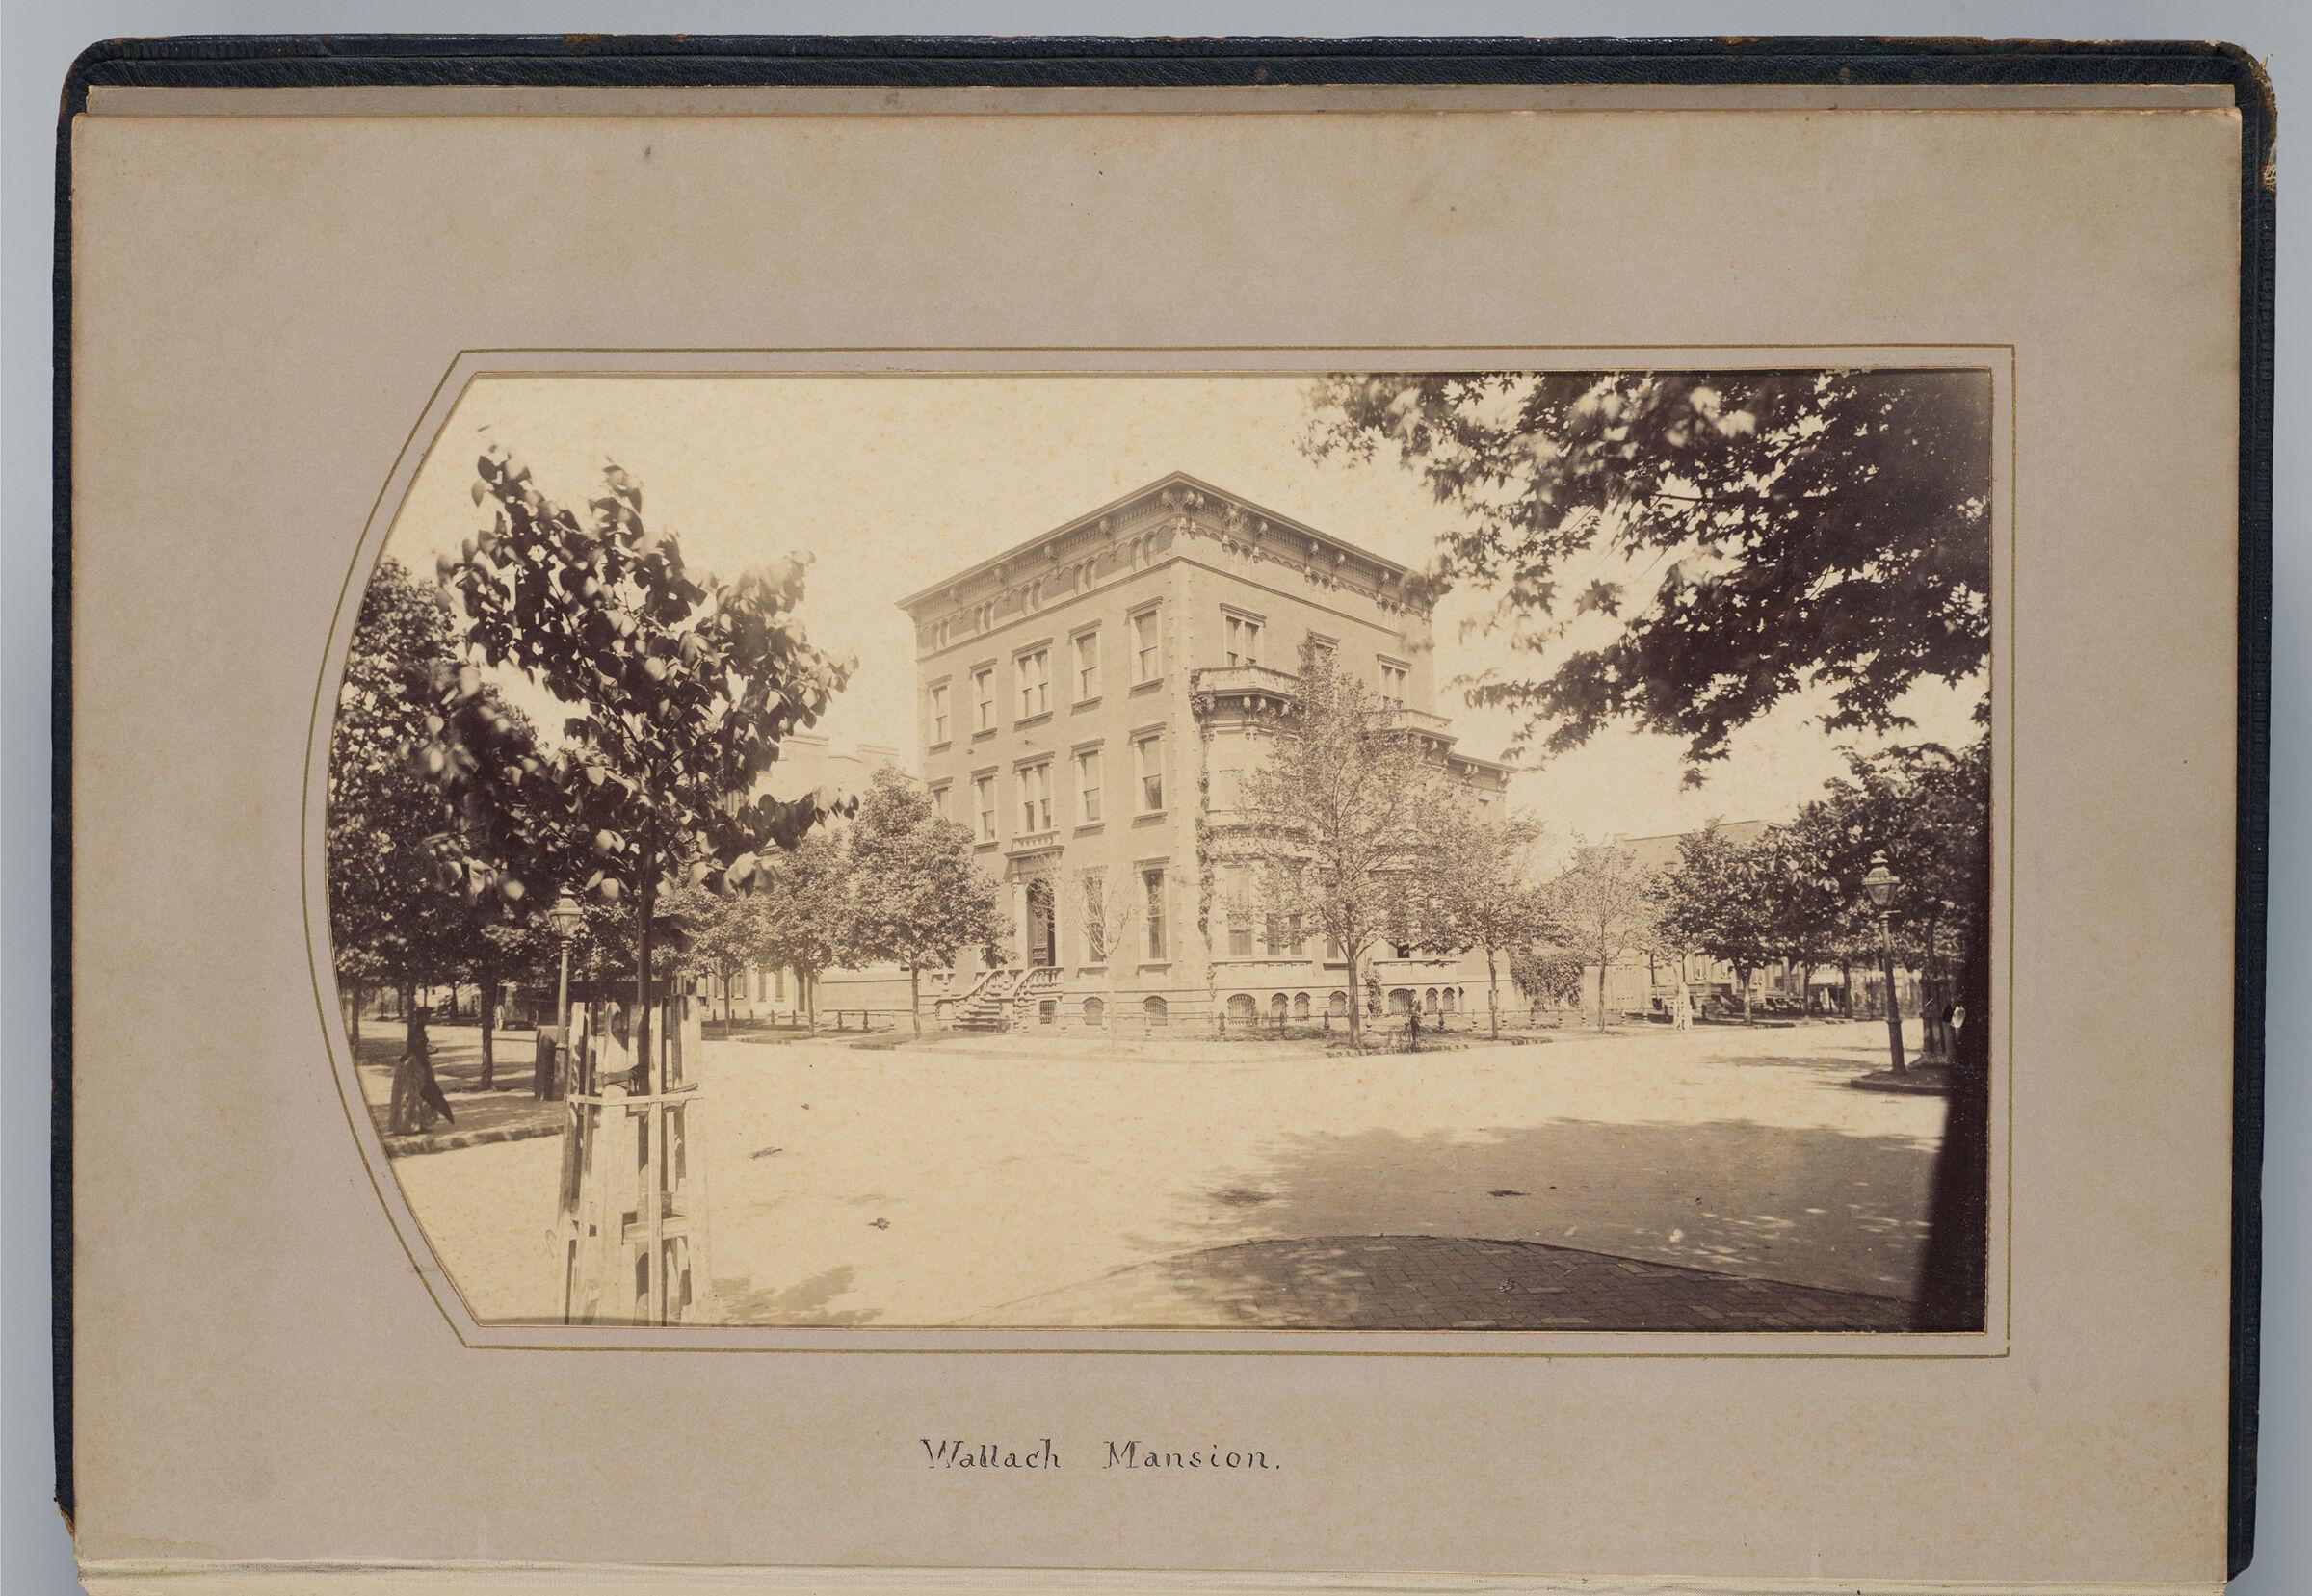 Wallach Mansion